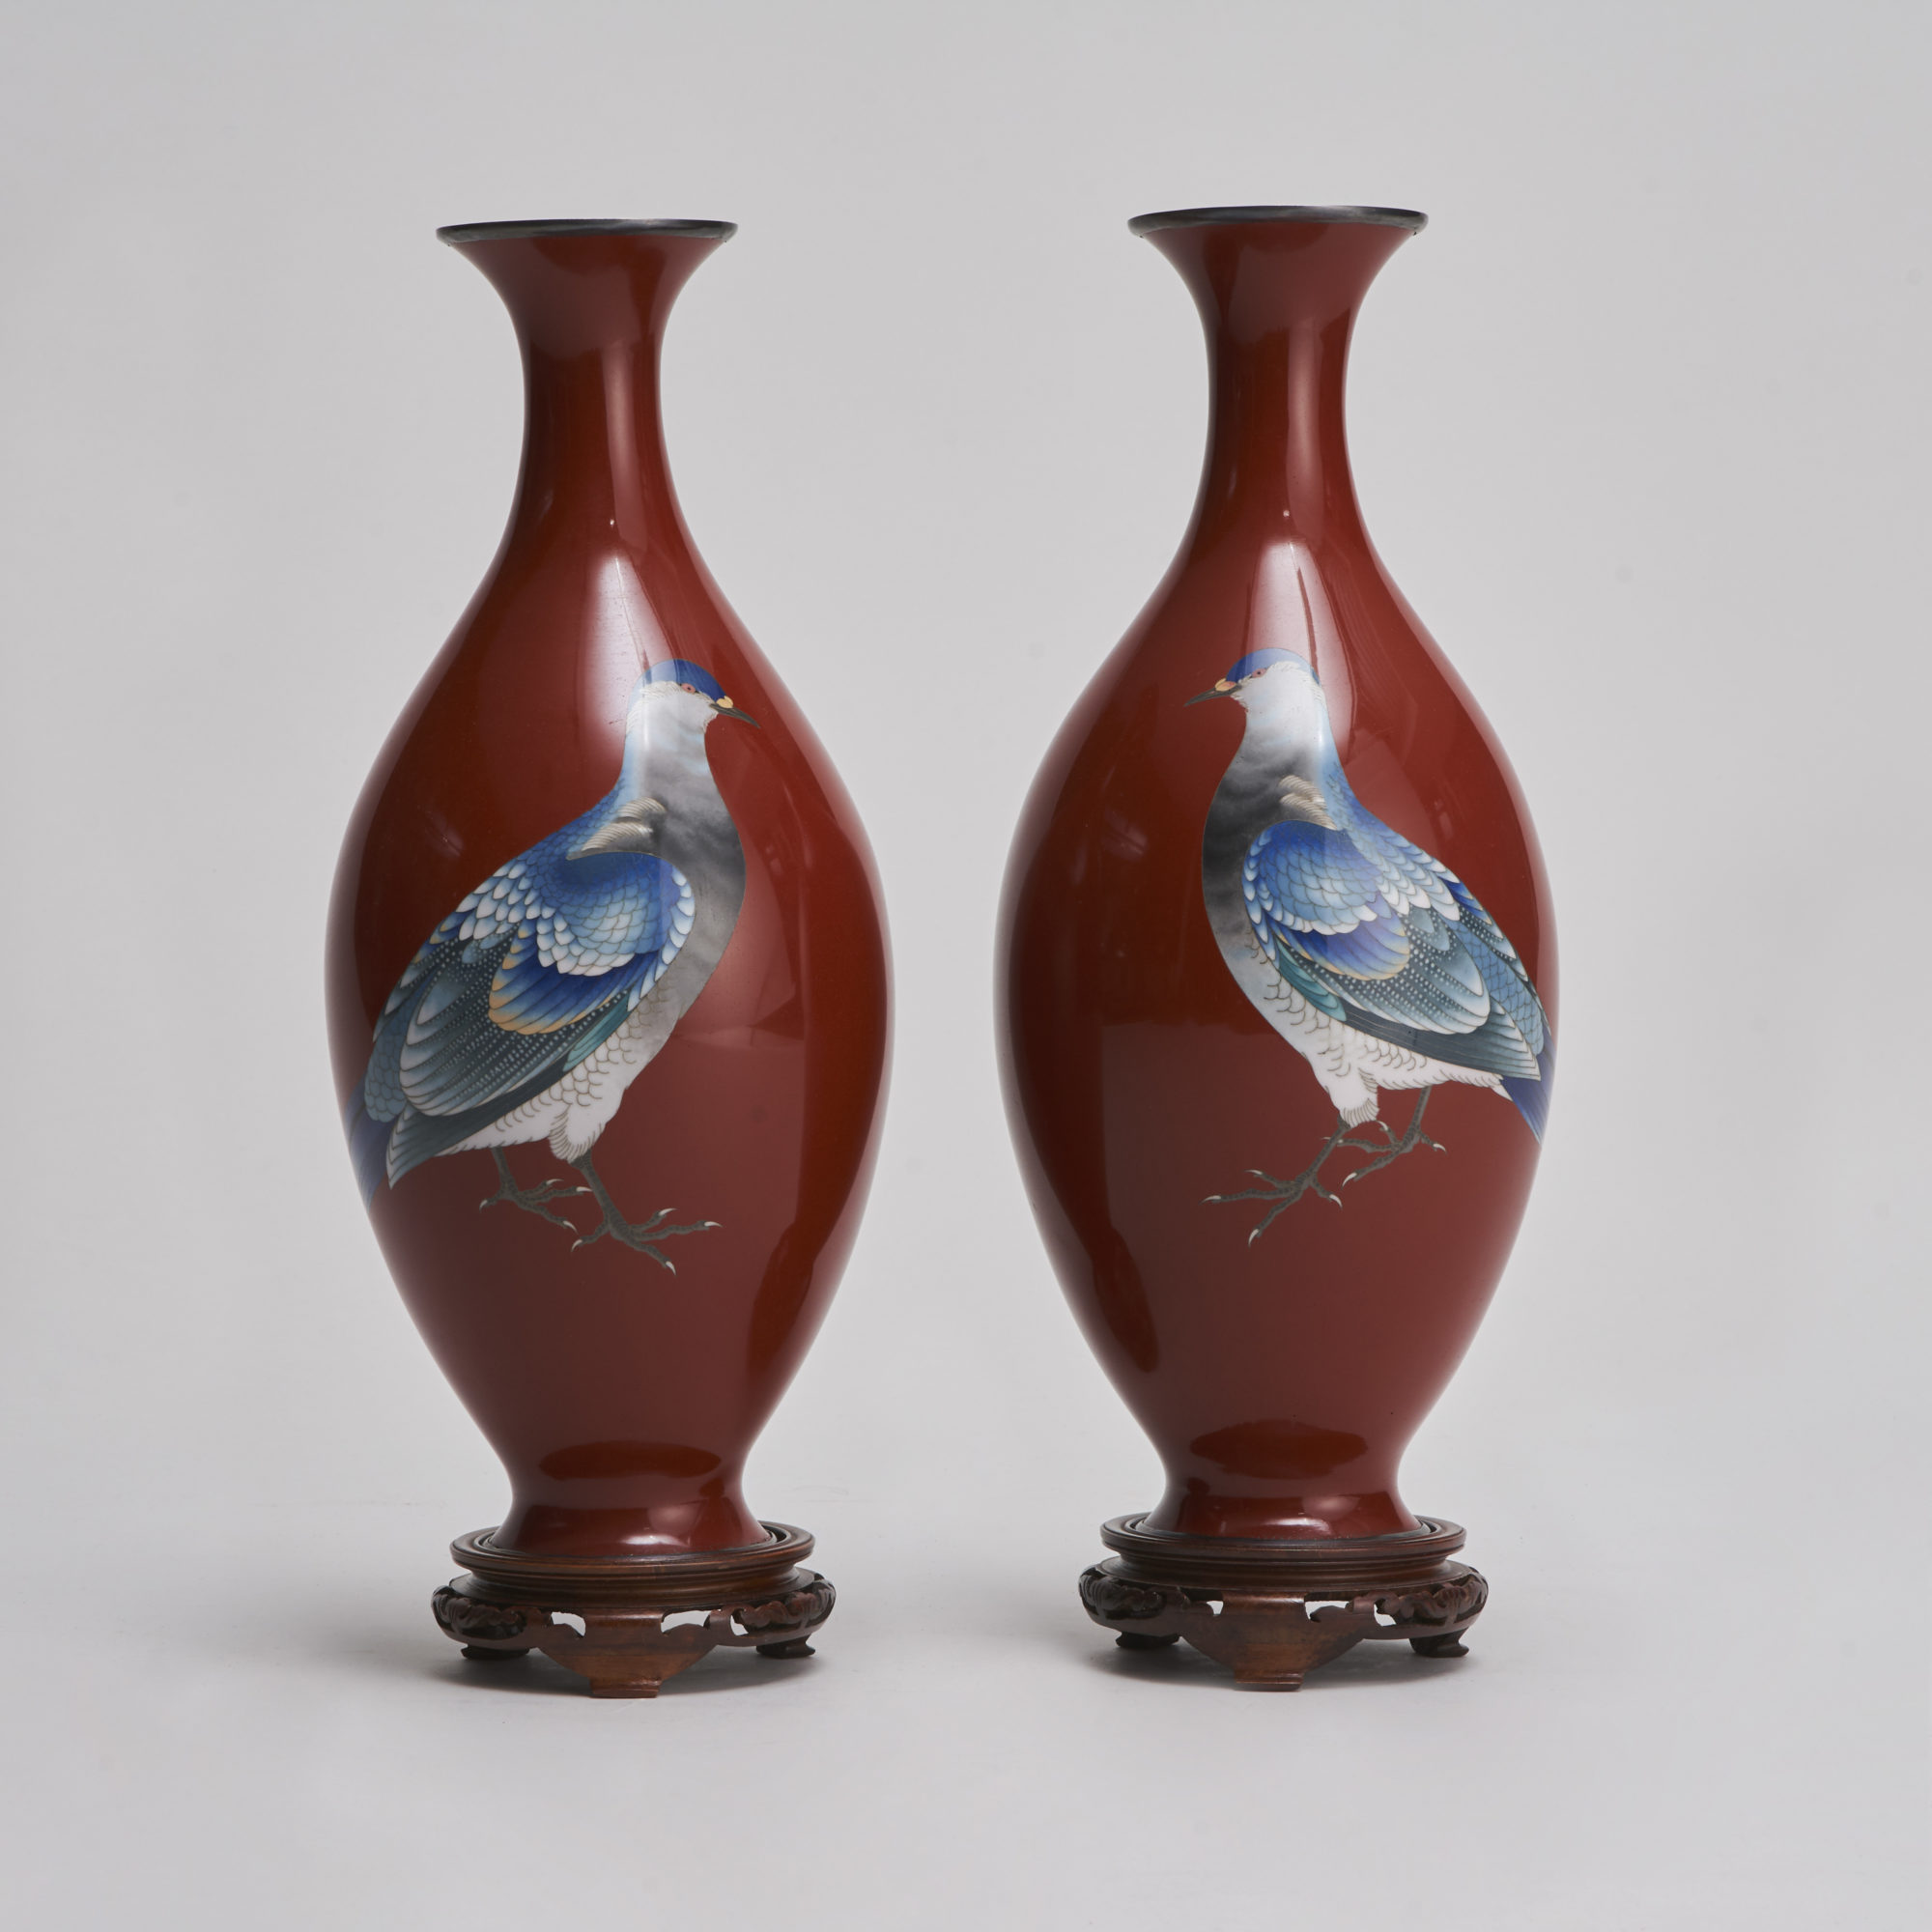 Gonda Hirosuke   An exquisite pair of Japanese Cloisonne vases (Gonda Hirosuke)